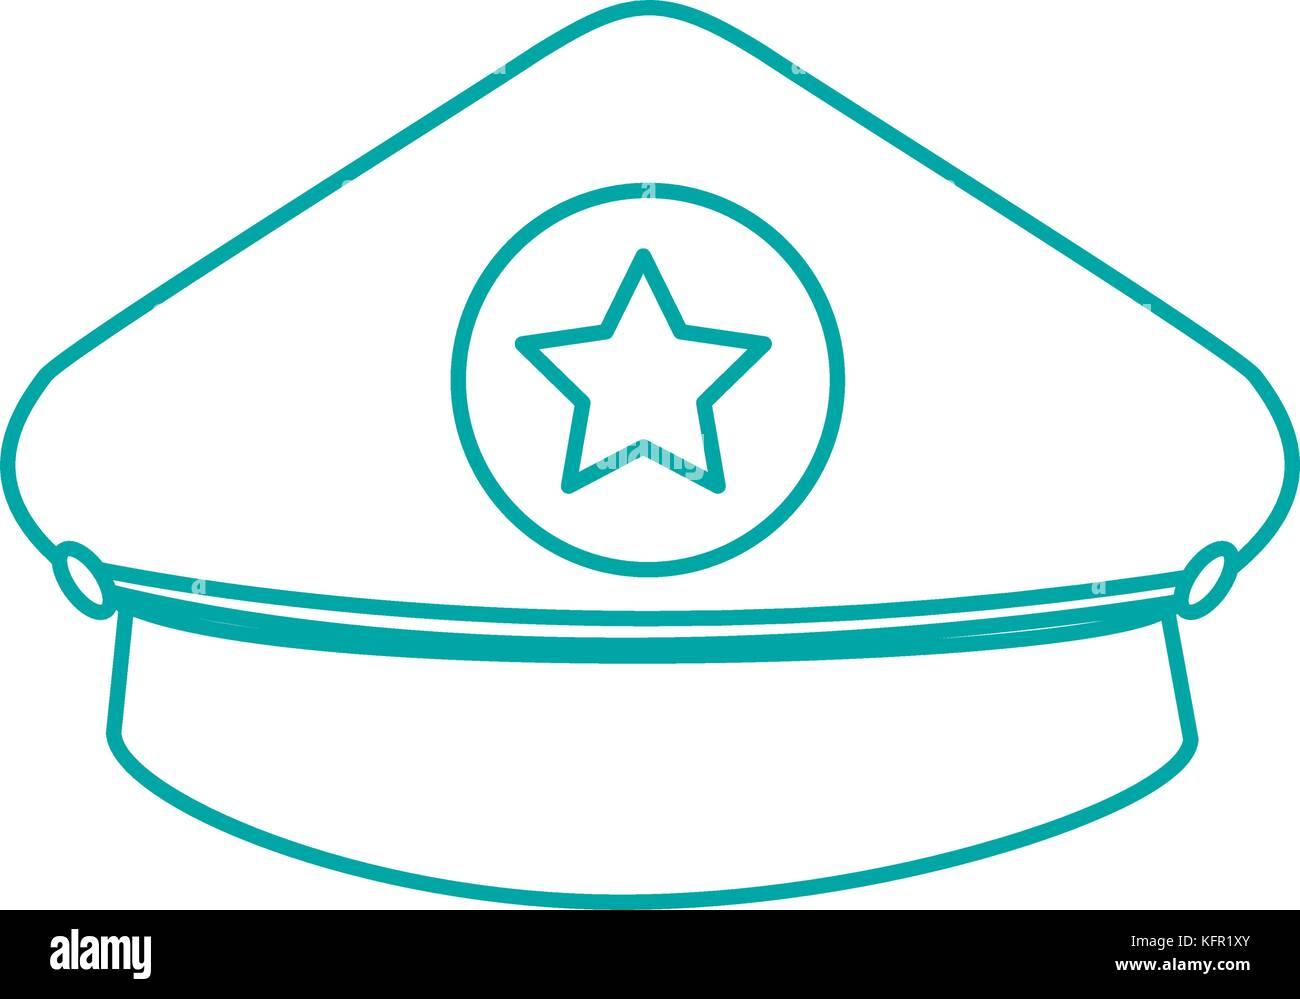 police cap icon - Stock Image